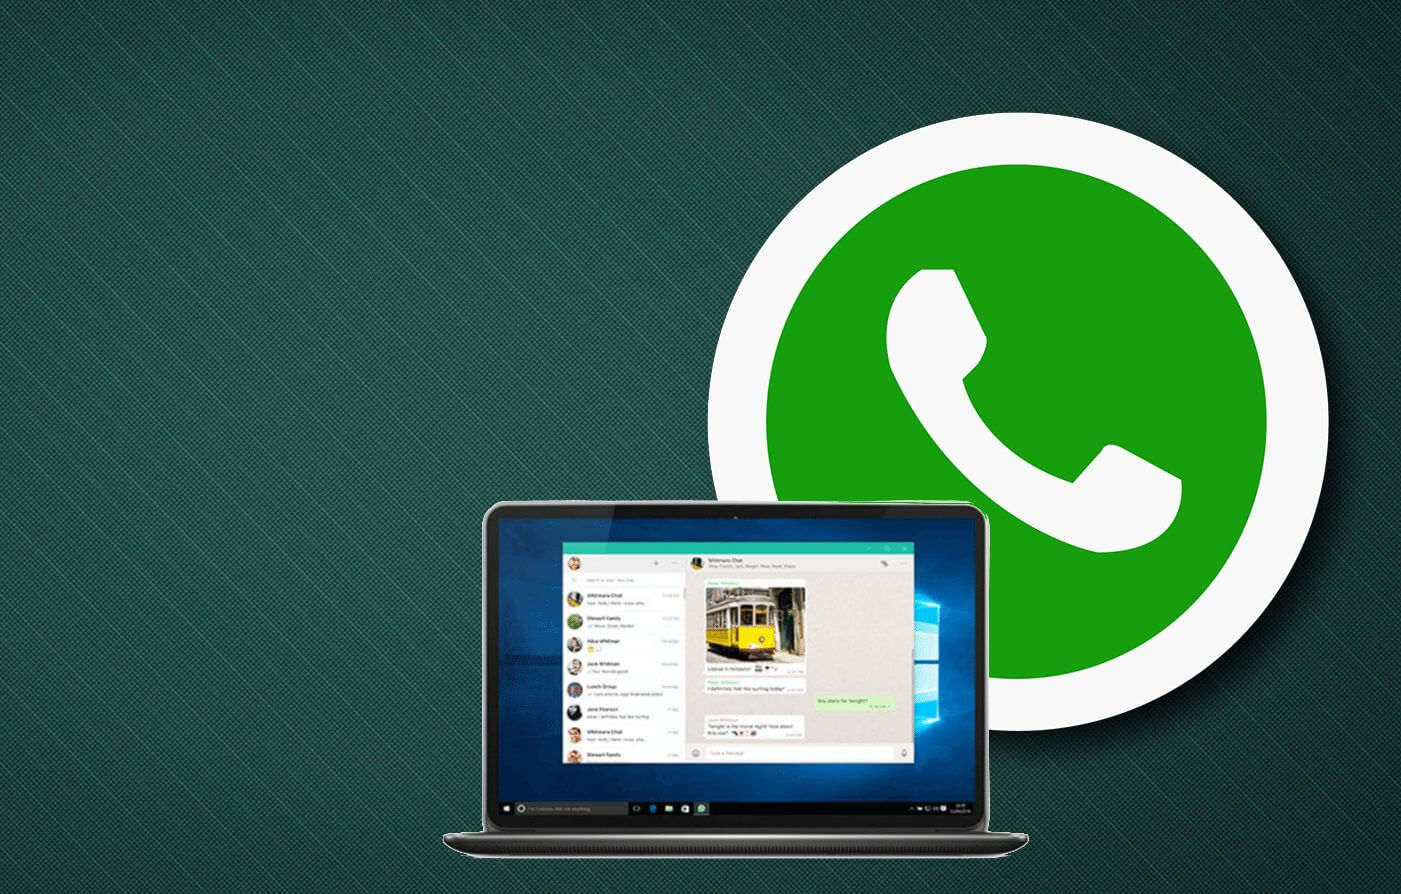 whatsapp desktop pc windows - Whatsapp ganha novo aplicativo para PCs e Macs